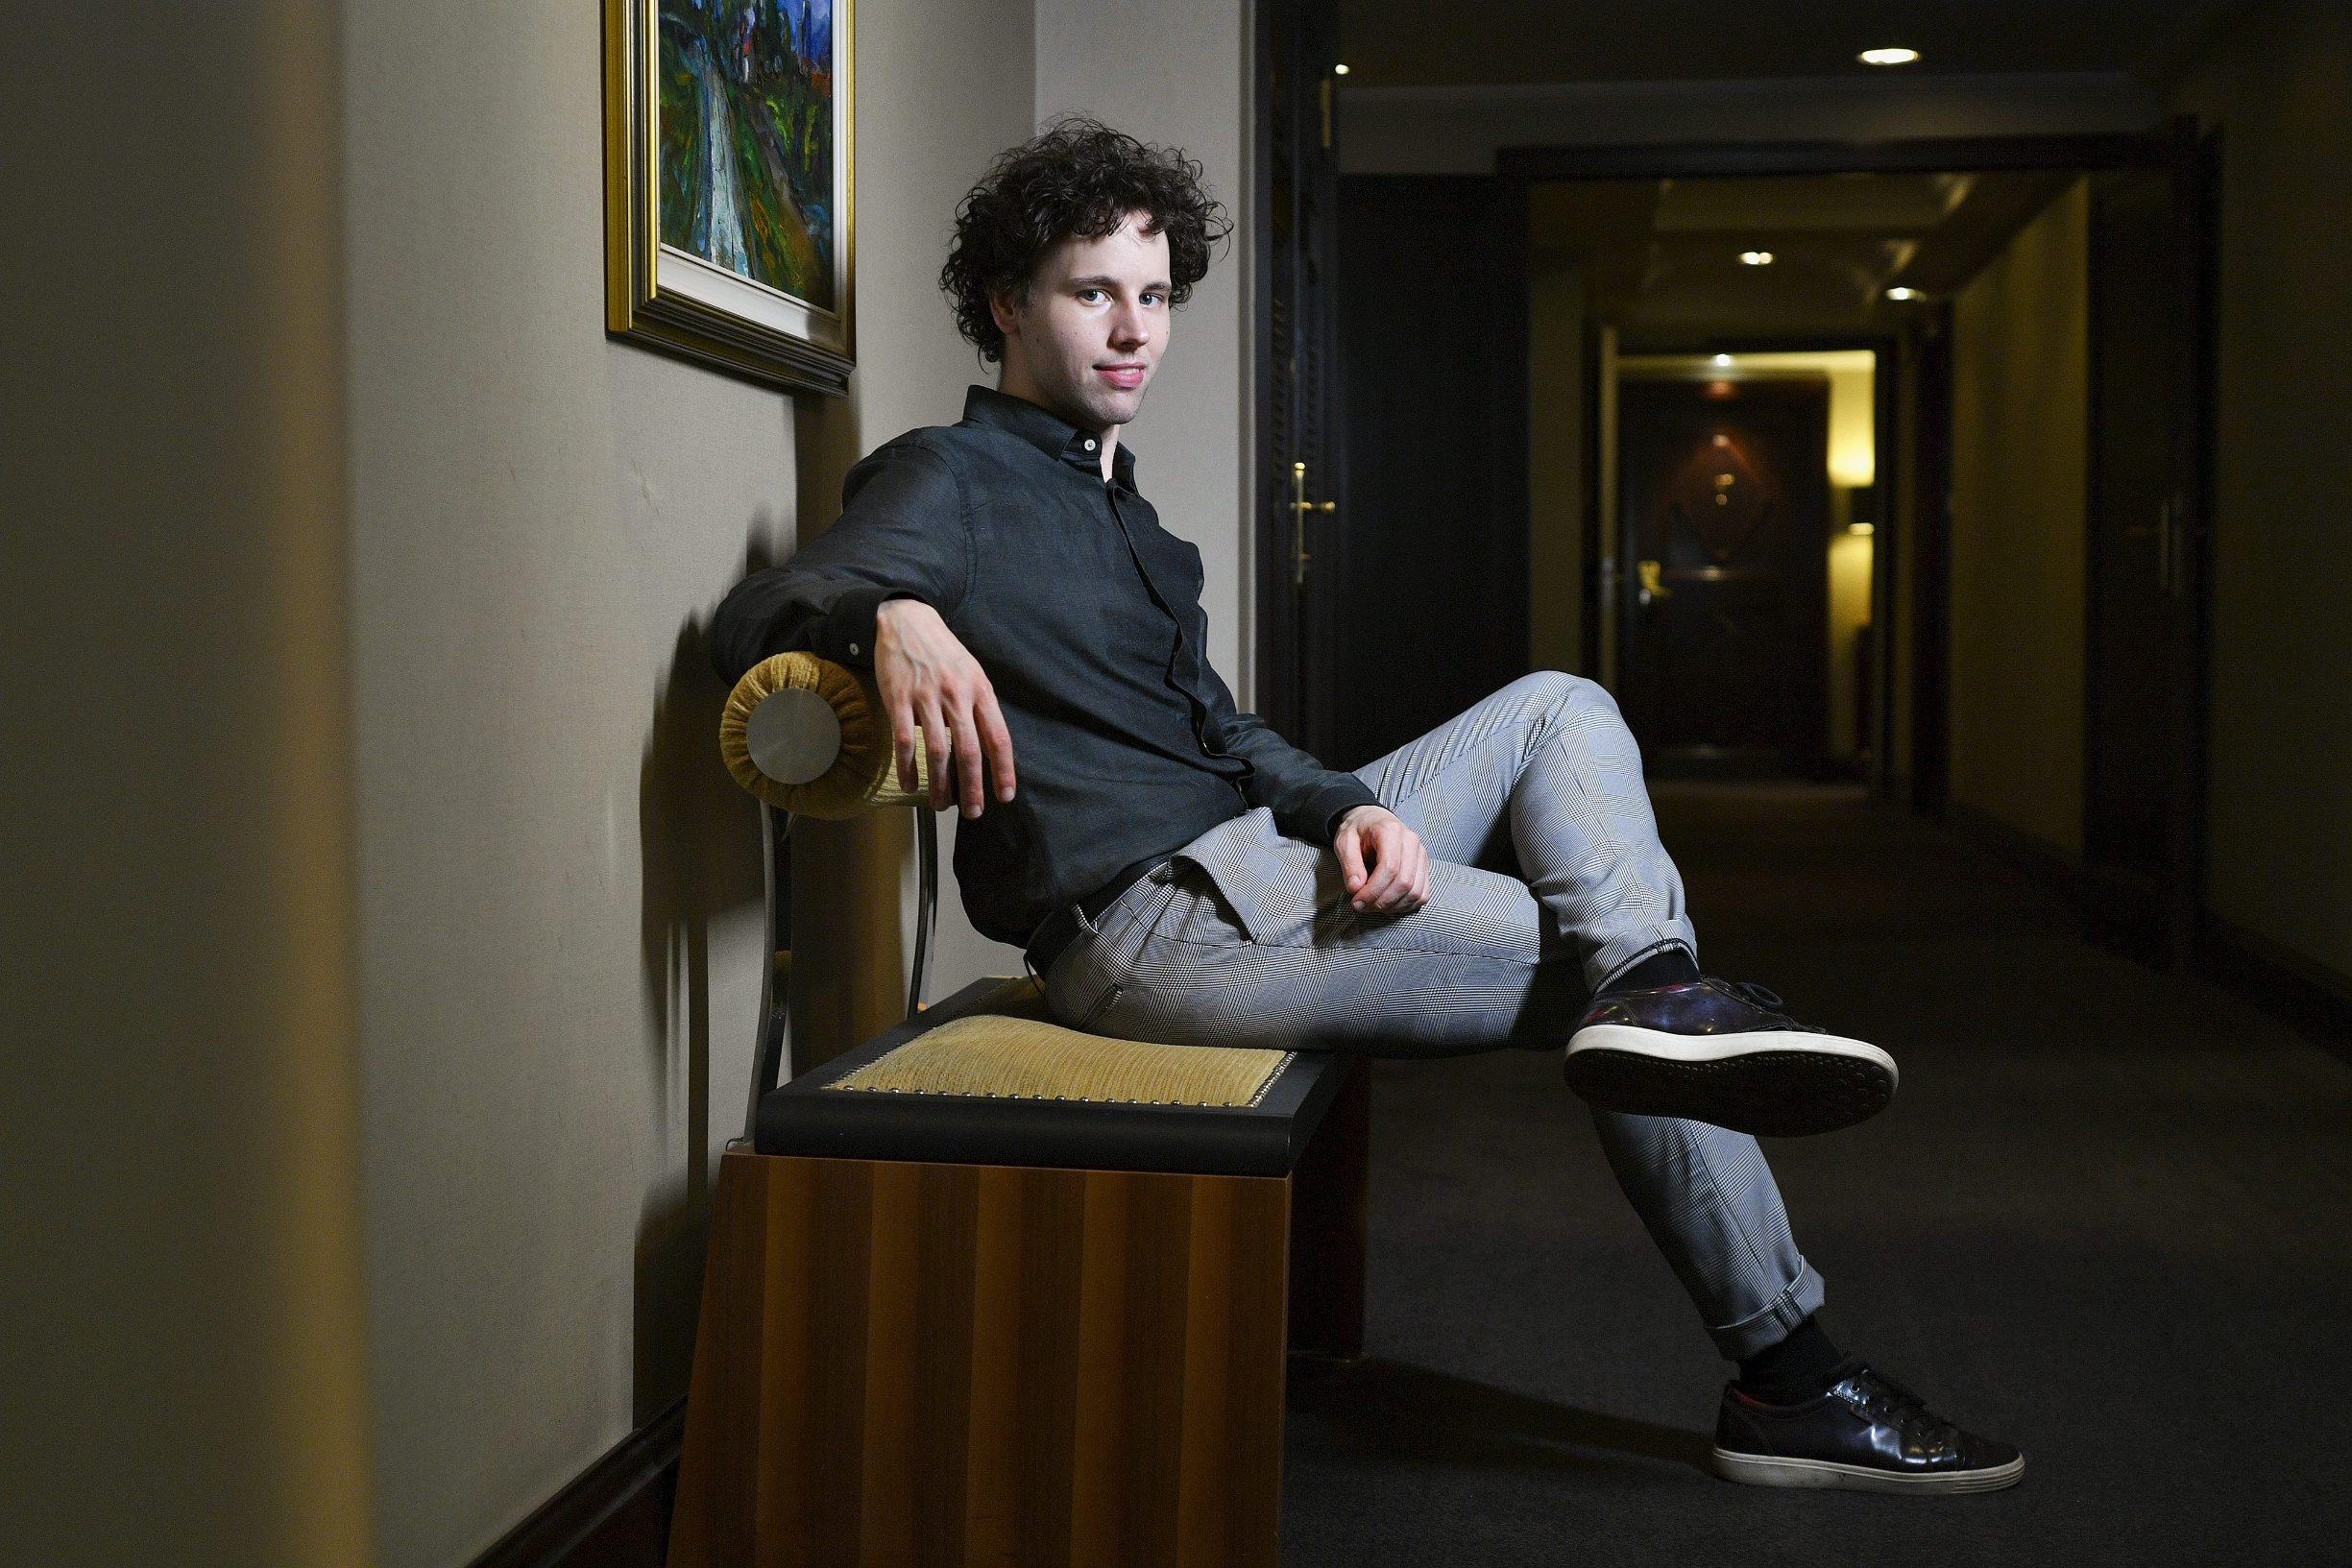 Zagreb, 100619. Pijanist Aljosa Jurinic, fotografiran u hotelu Esplanade. Foto: Boris Kovacev / CROPIX